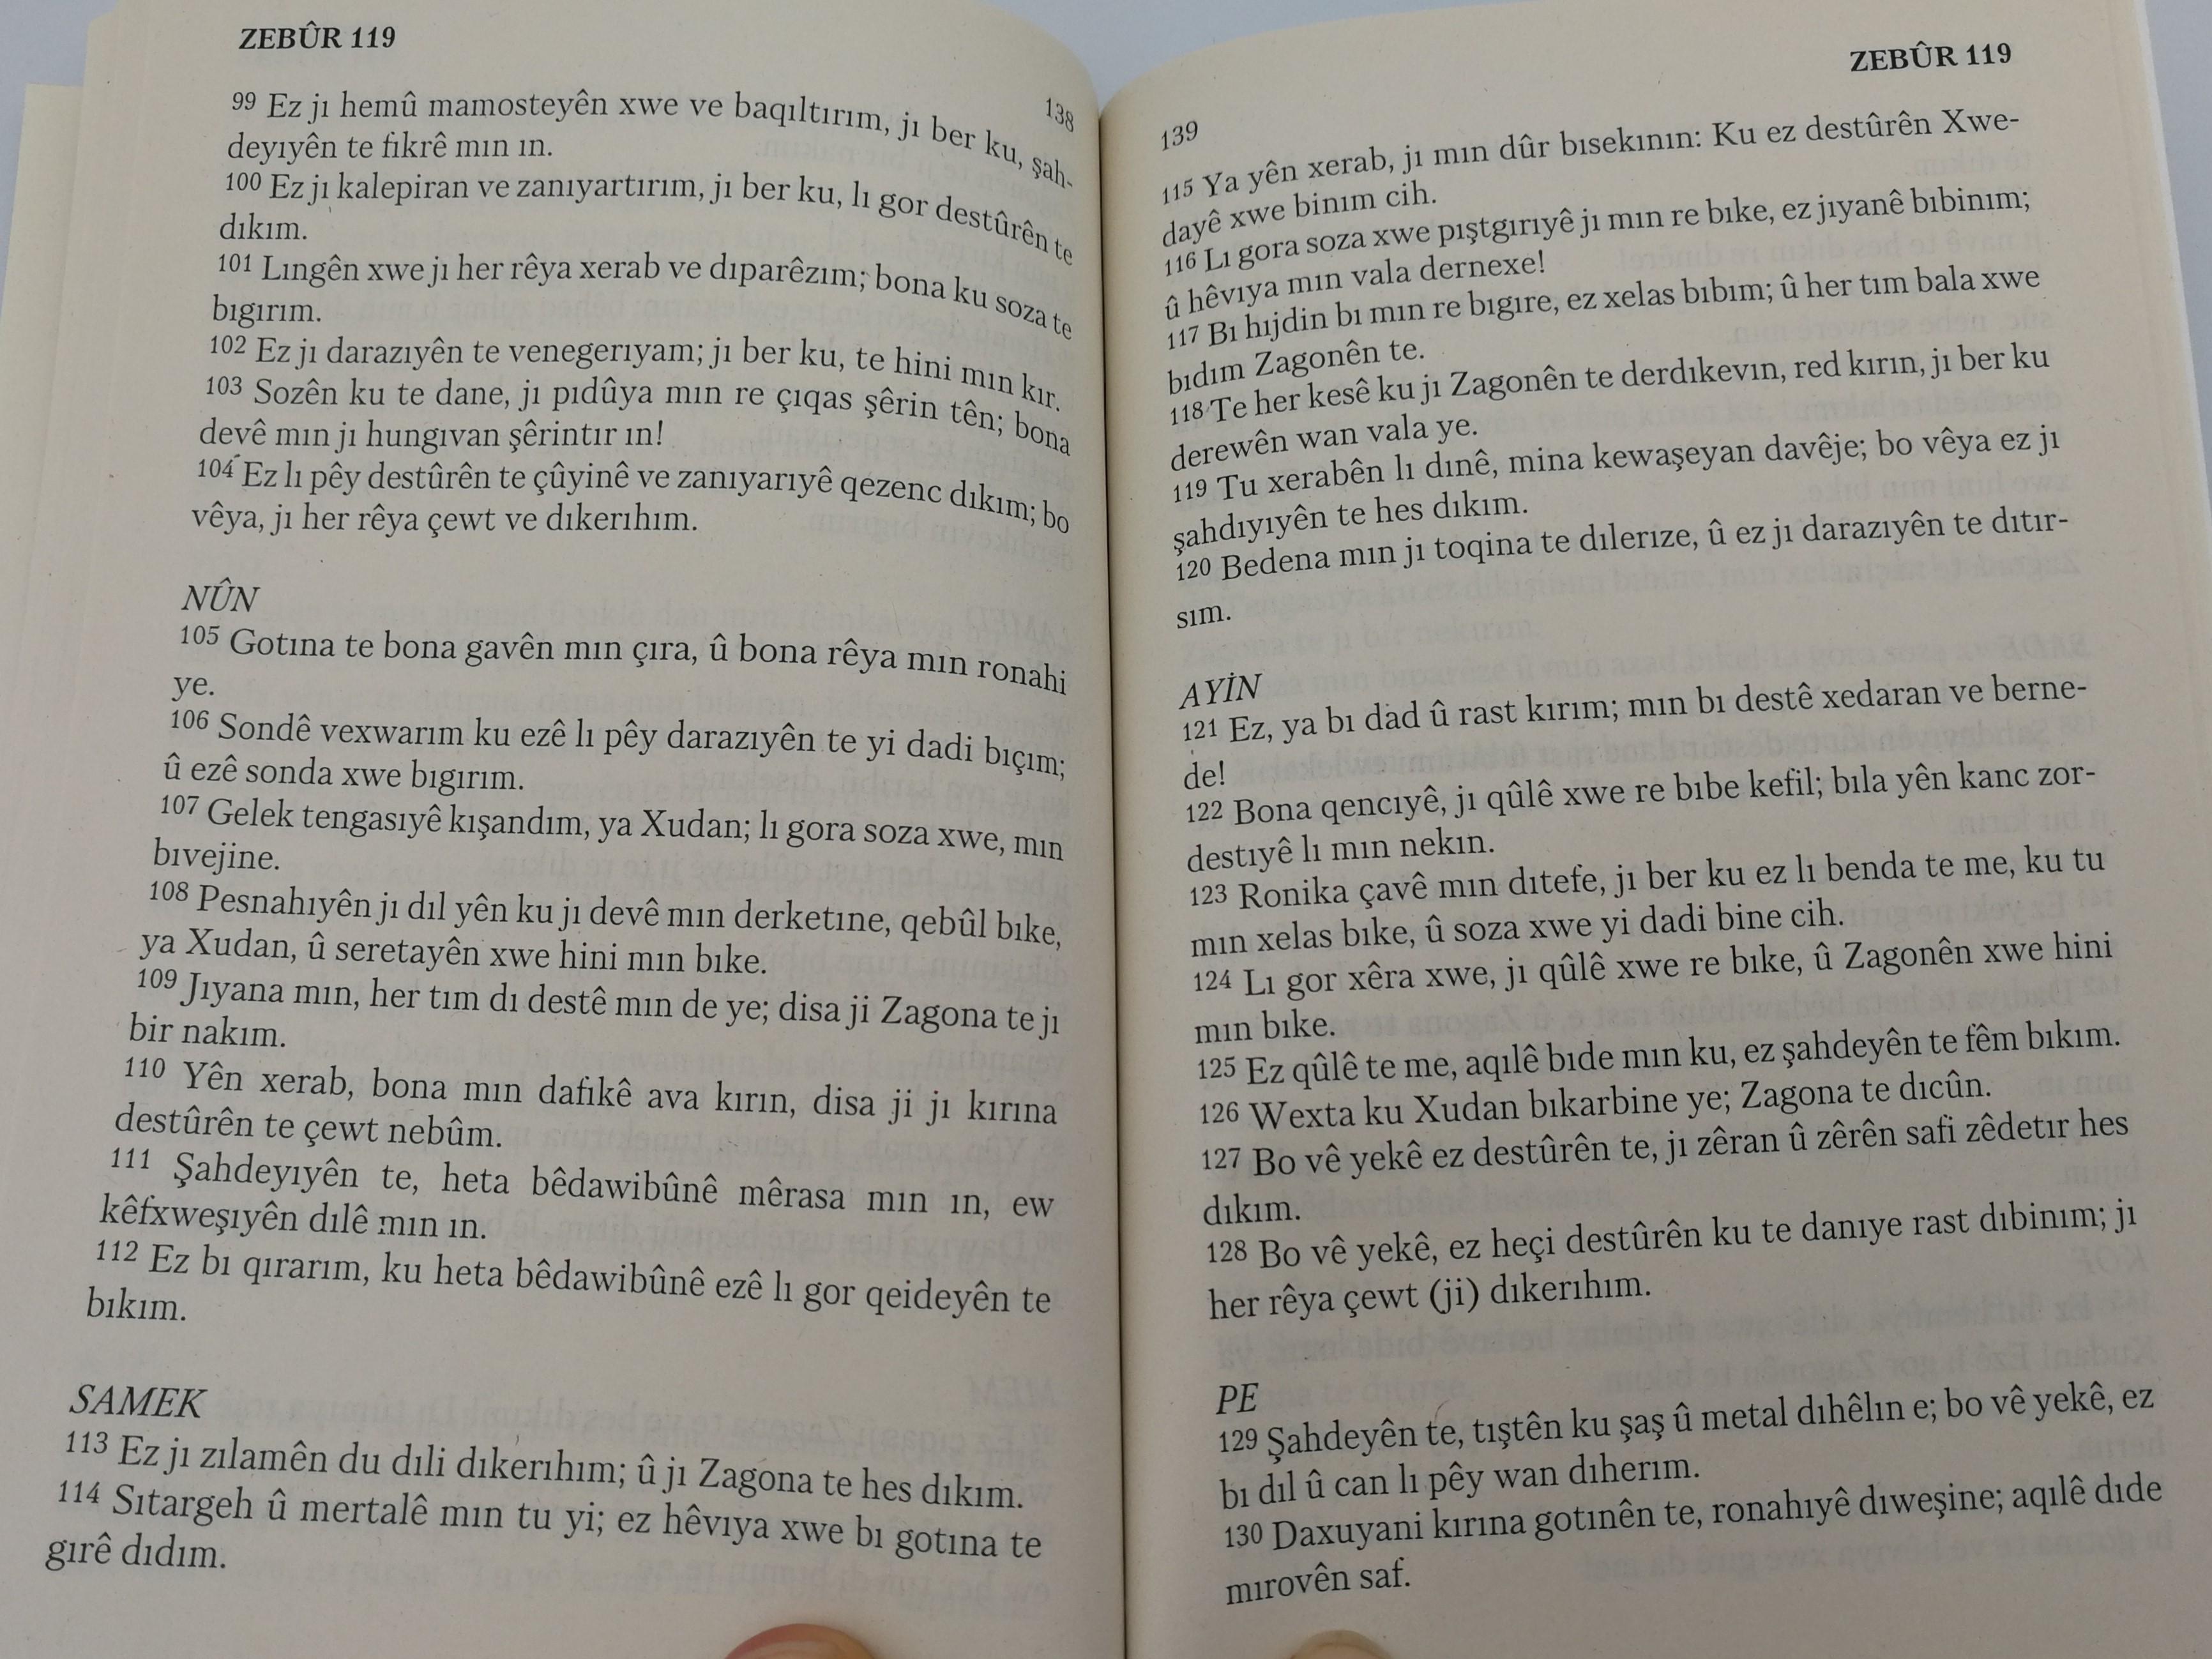 zebur-the-psalms-in-kurdish-kurmanji-7.jpg